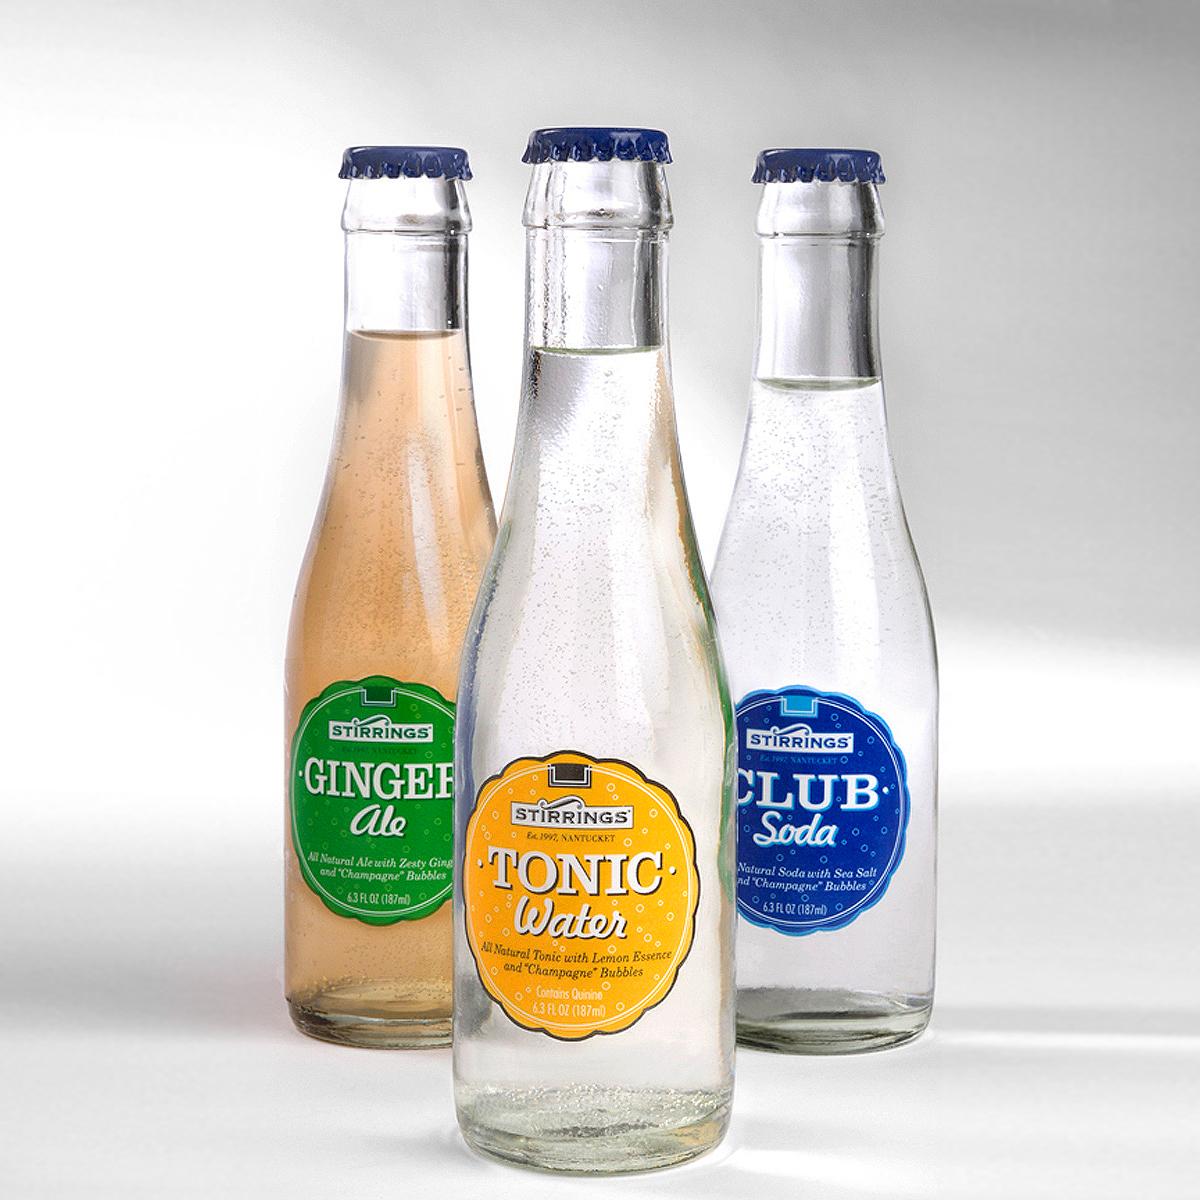 PACKAGE DESIGN - Stirrings | cocktail sodas bottles - ©UnParalleled, LLC dba UP-Ideas / Roger Sawhill / Mark Braught - Atlanta, Georgia | Lawrenceville, Georgia | Commerce, Georgia